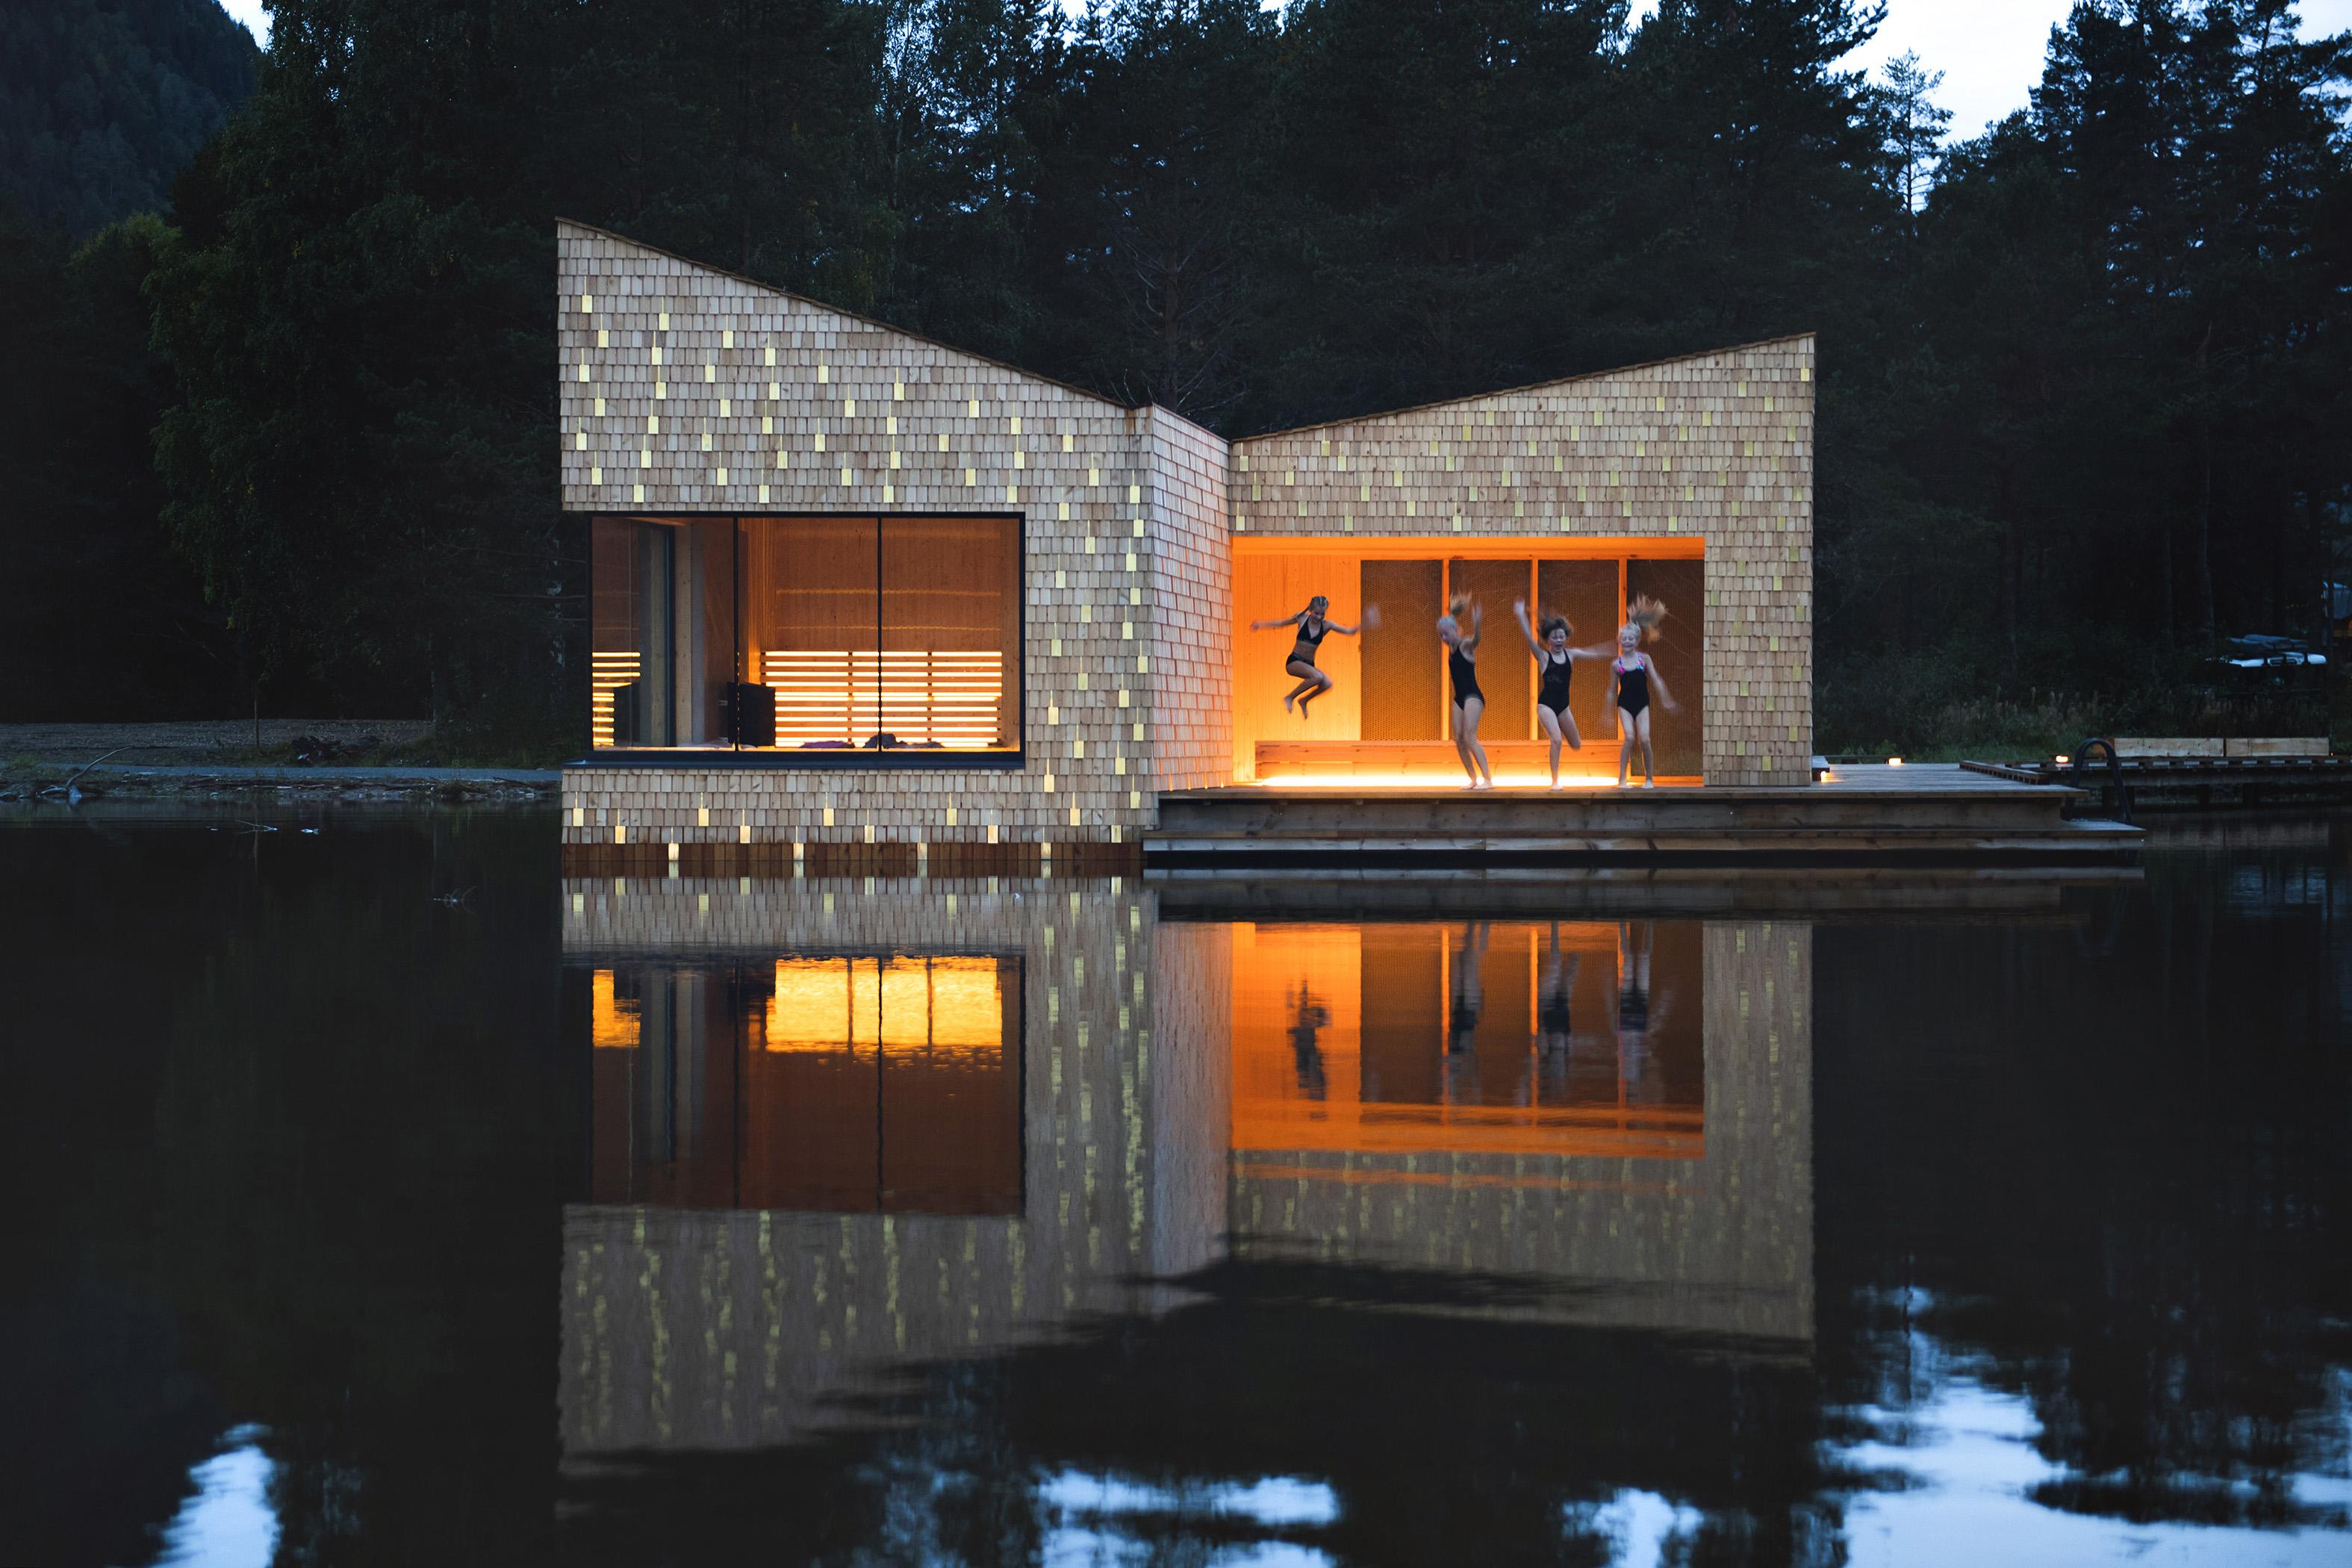 Tre grensesprengende arkitekturprosjekter nominert til hederspris